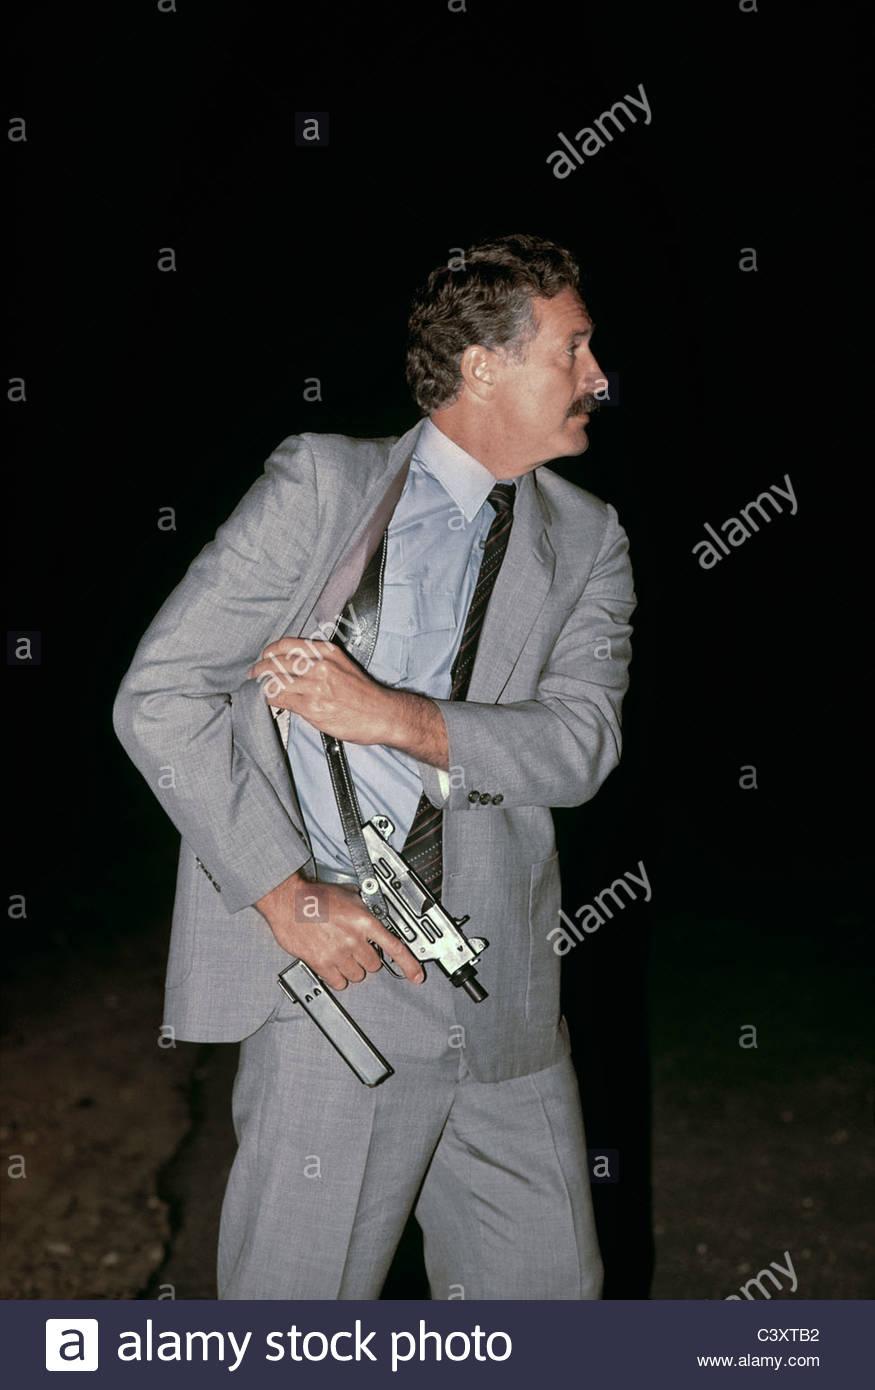 israeli-secret-service-agent-draws-an-uzi-pistol-from-his-shoulder-C3XTB2.jpg